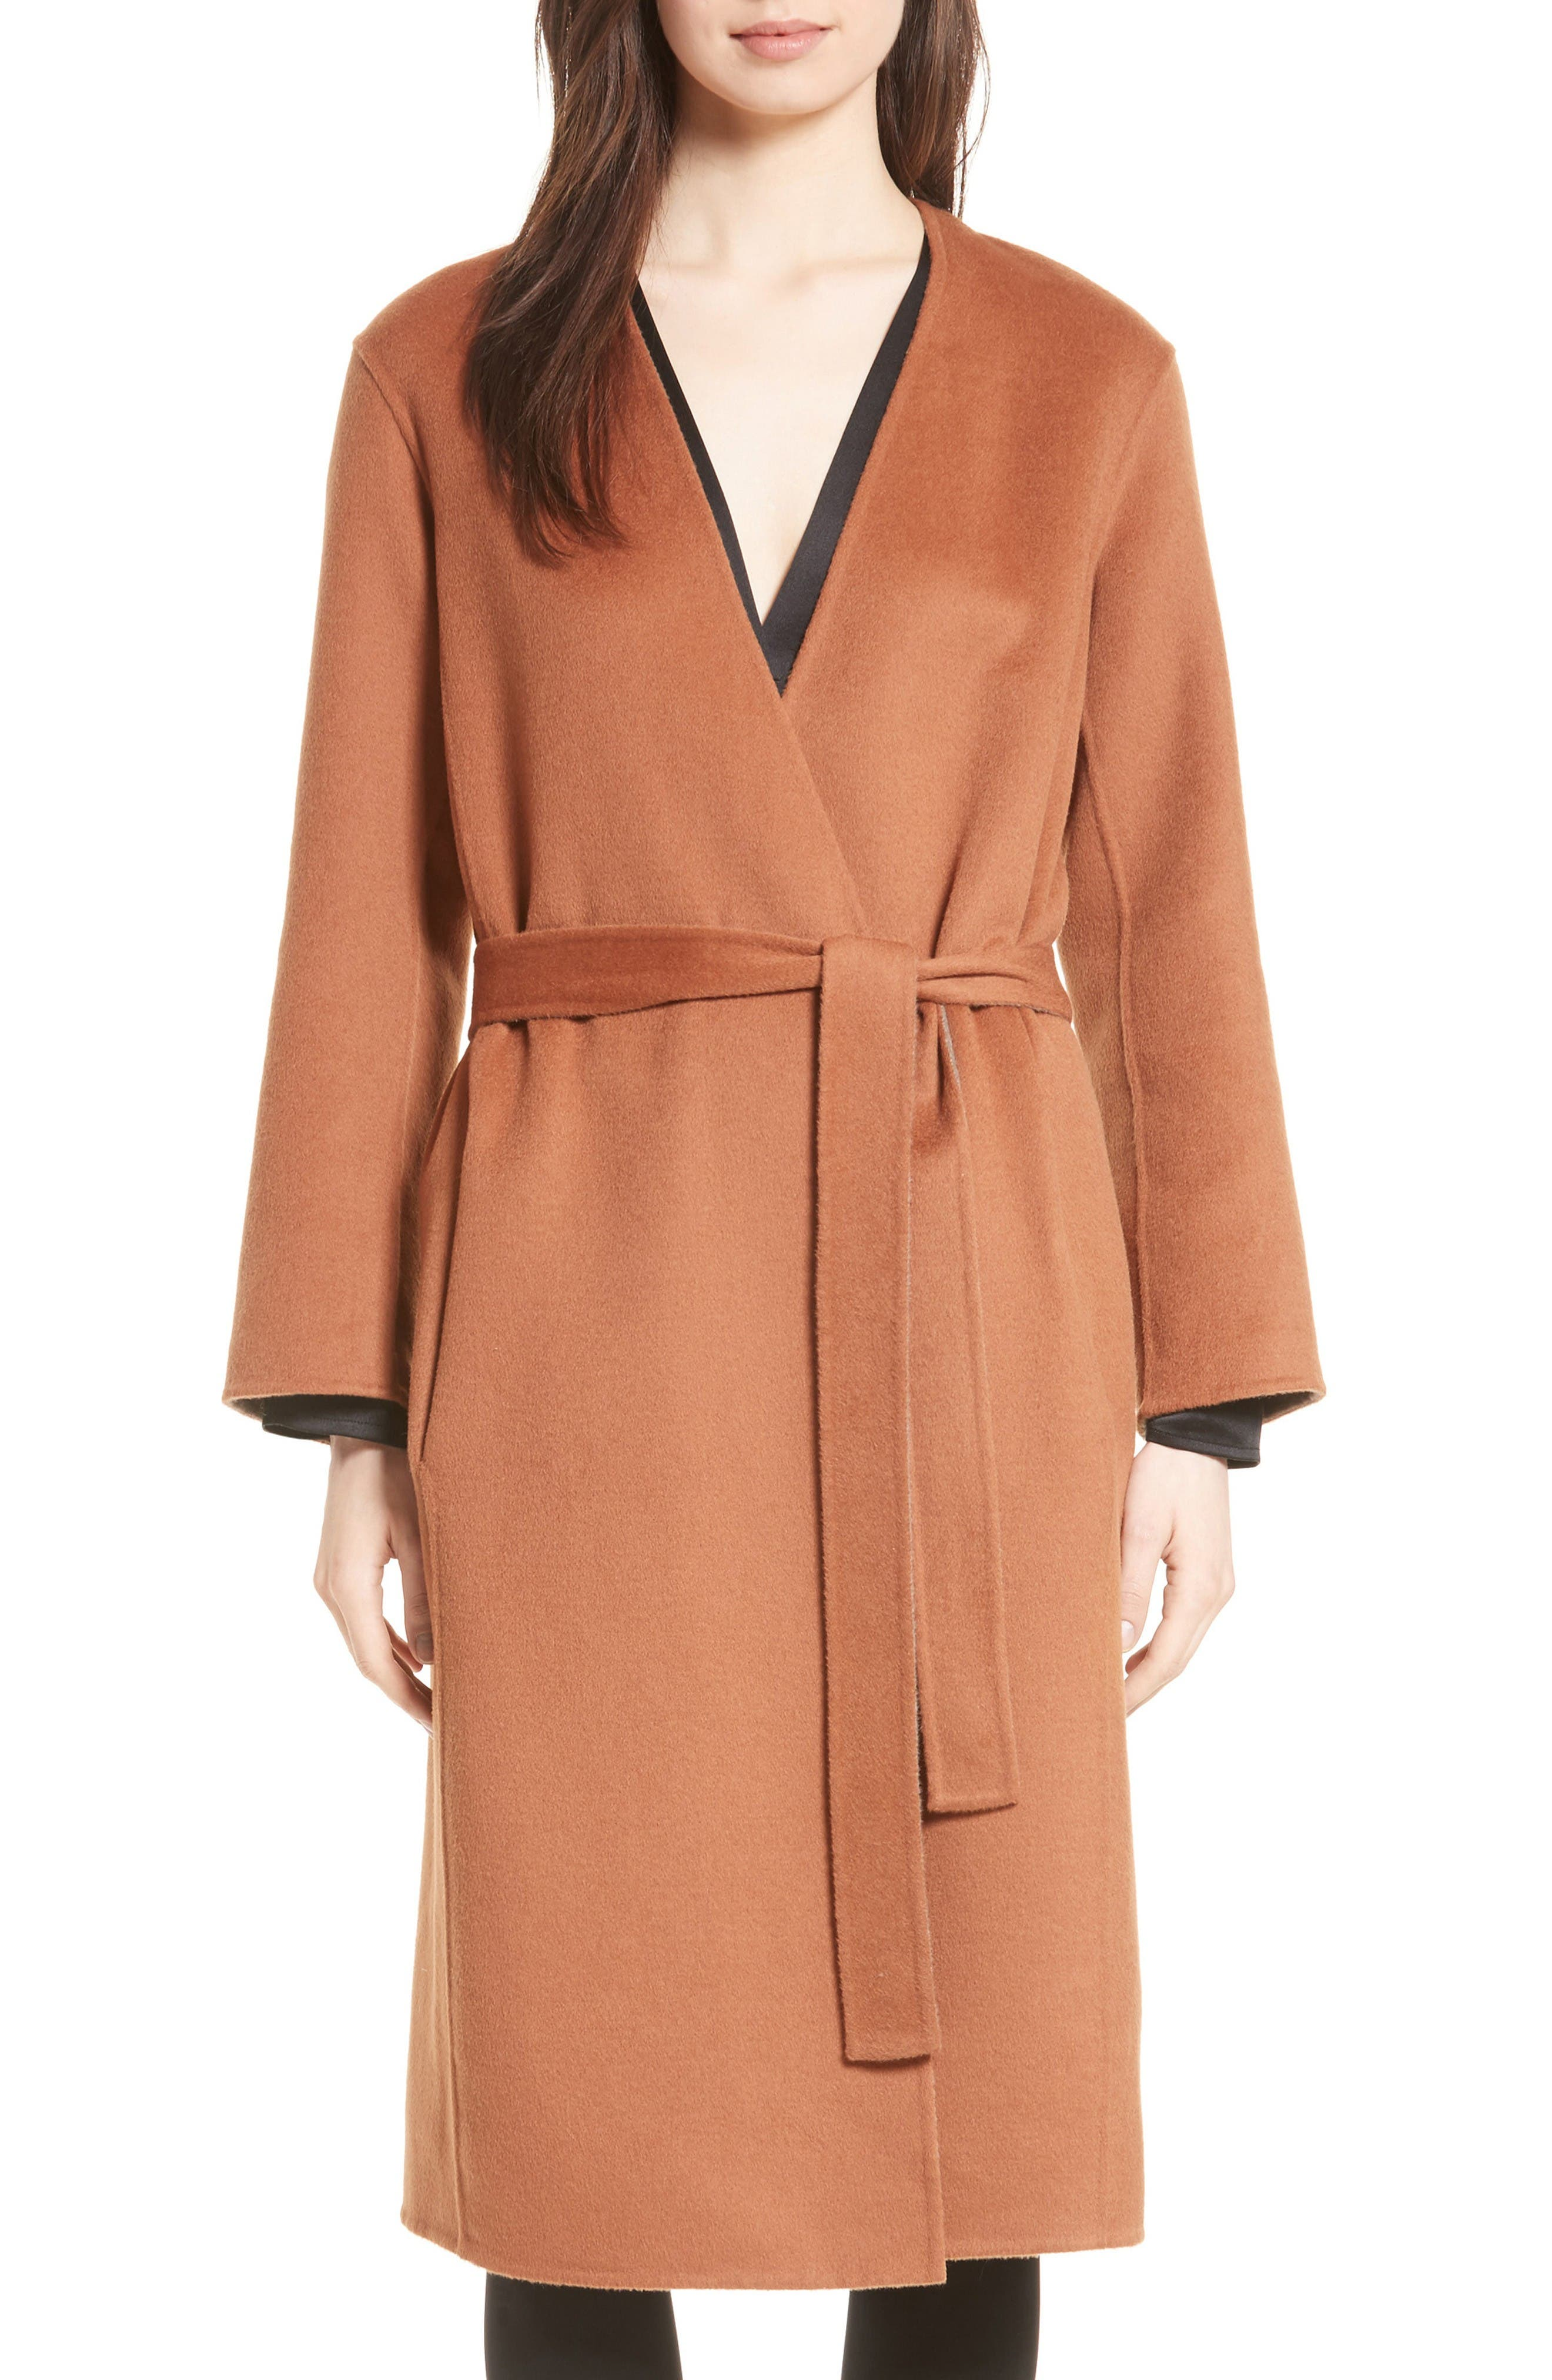 Alternate Image 1 Selected - Vince Reversible Wool & Cashmere Belted Coat